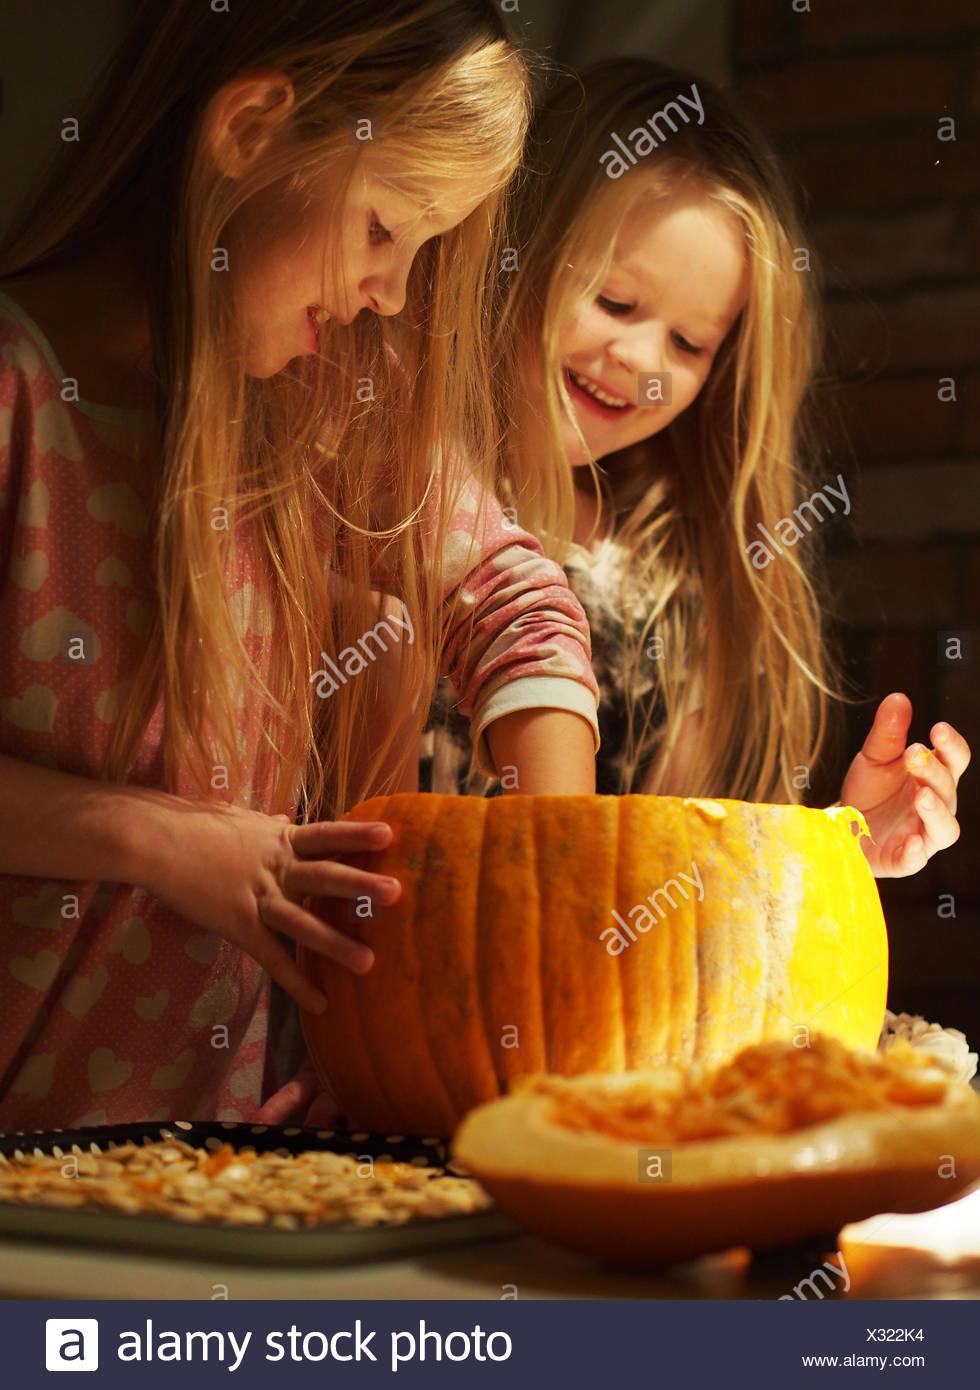 Sweden, Girls preparing (6-7), (8-9) the pumpkin for halloween - Stock Image